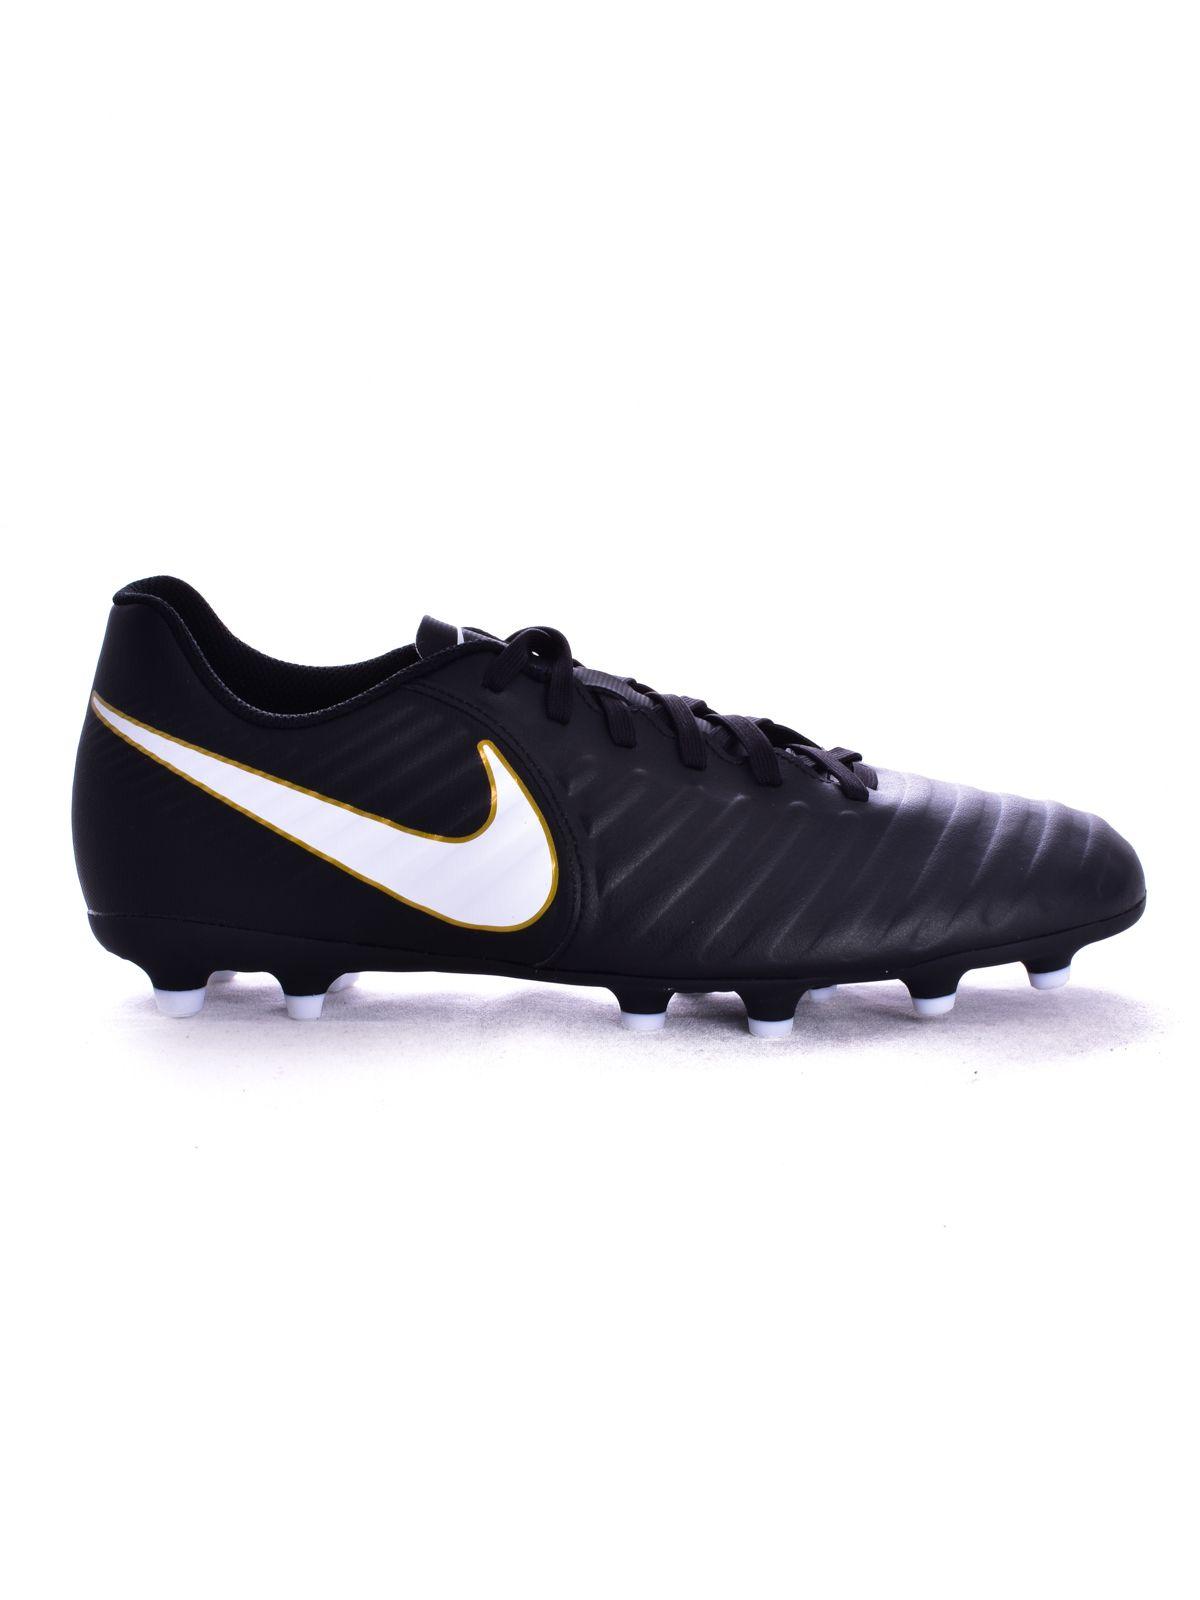 Nike férfi stoplis football cipő Tiempo Rio IV (FG) Firm-Ground Football  Boot ... d5989f01a3